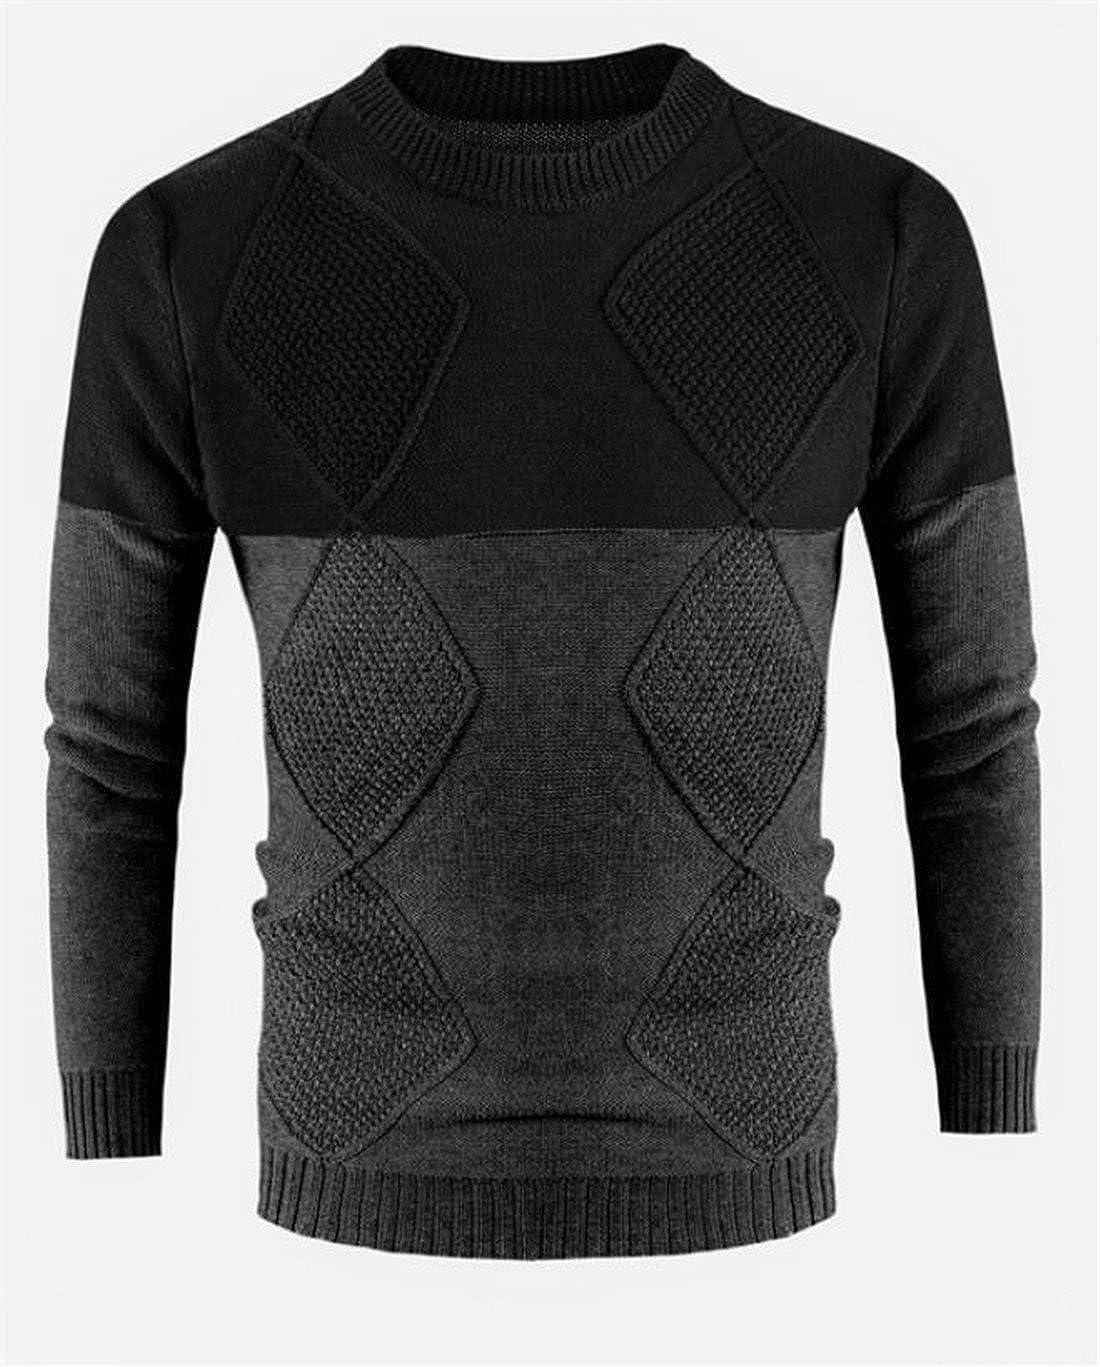 BLTR Men Contrast Crew-Neck Lightweight Casual Slim Fit Sweater Pullover